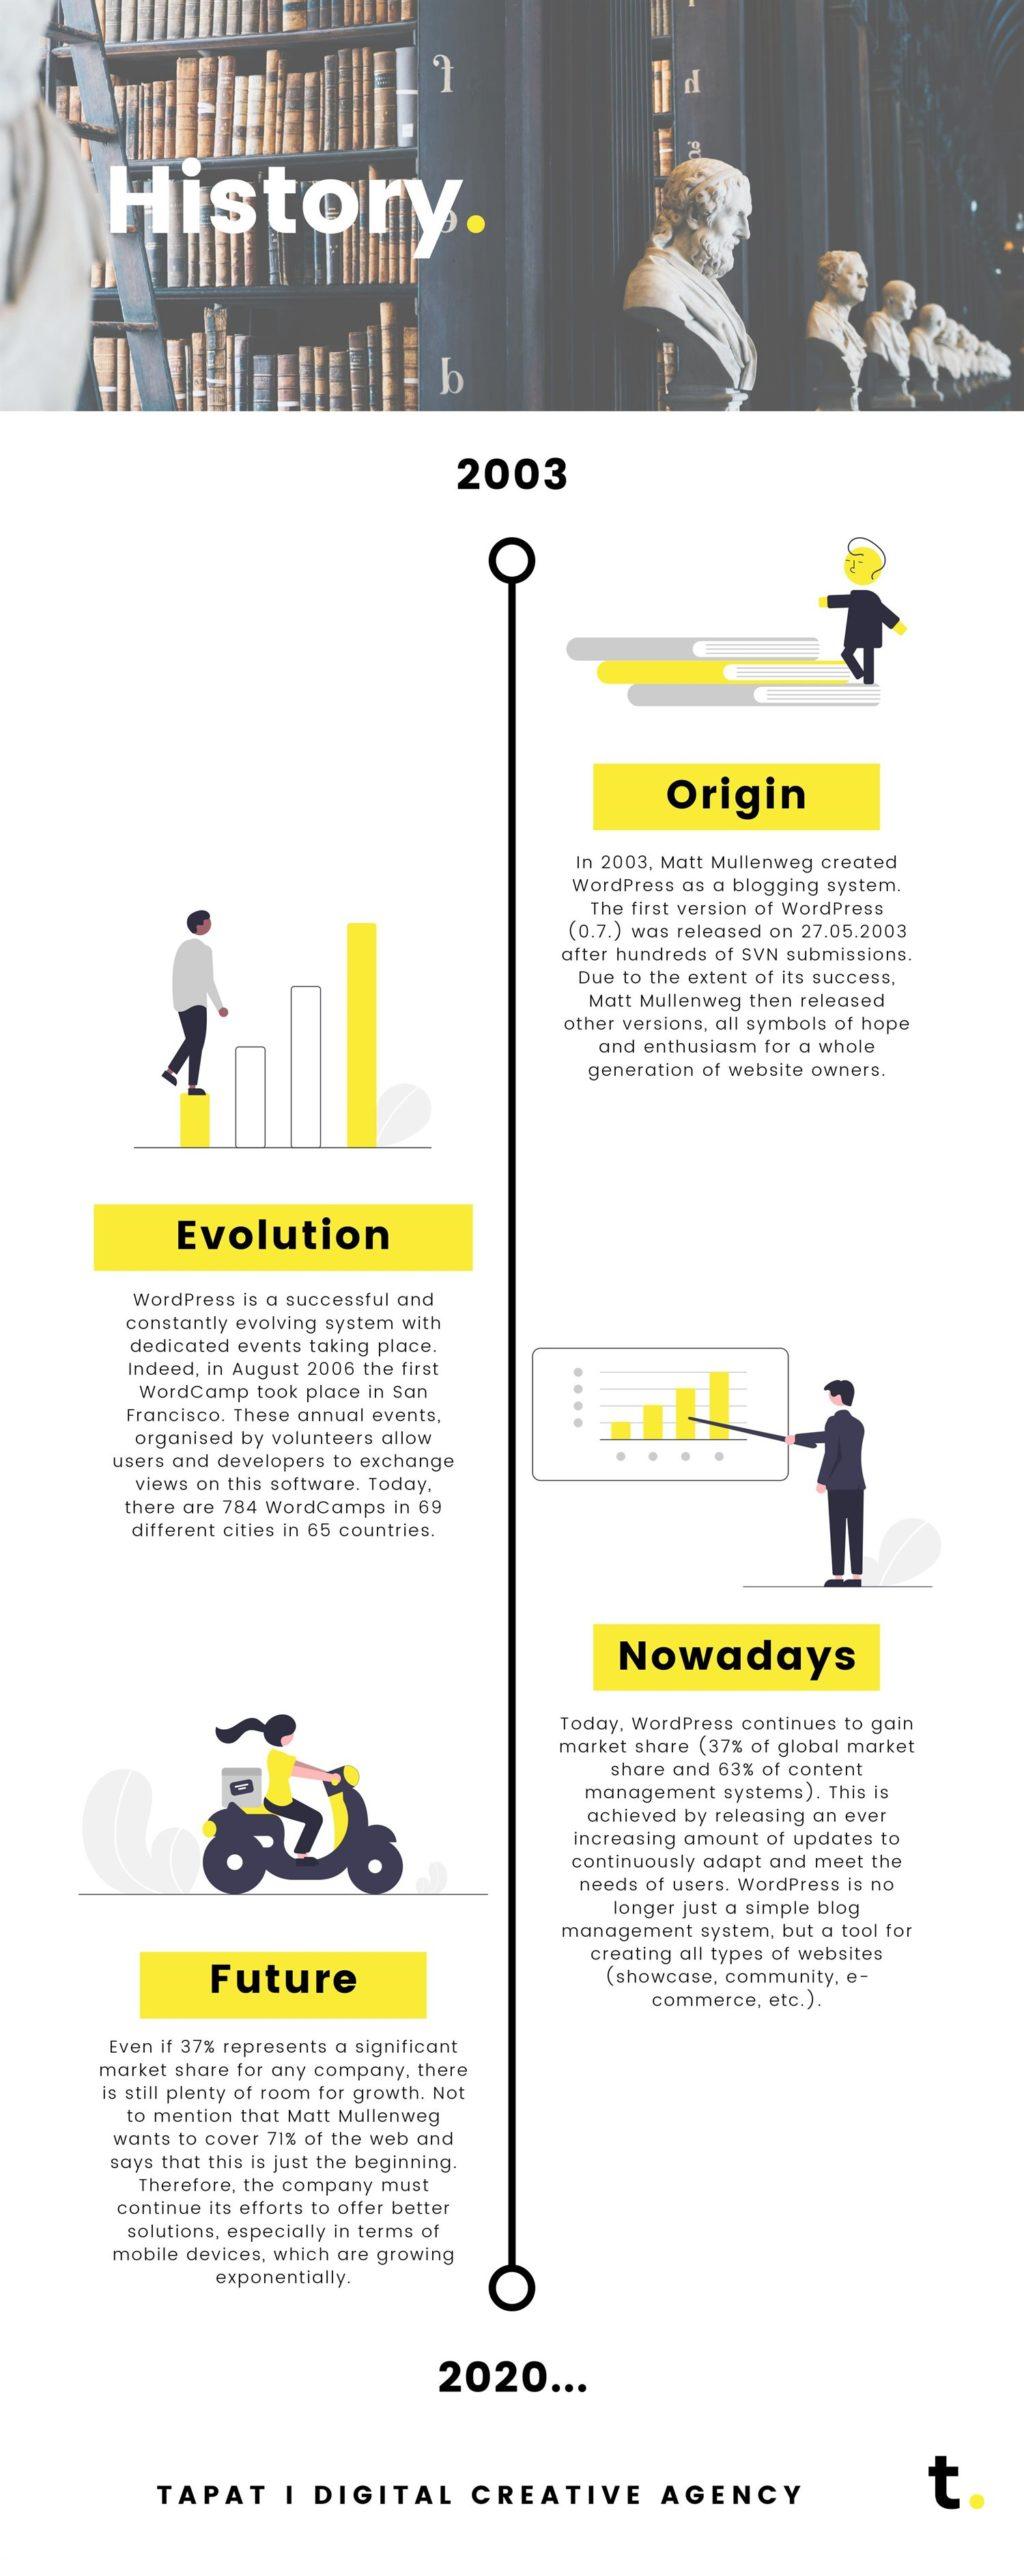 Wordpress infographic 02 history - tapat creative agency